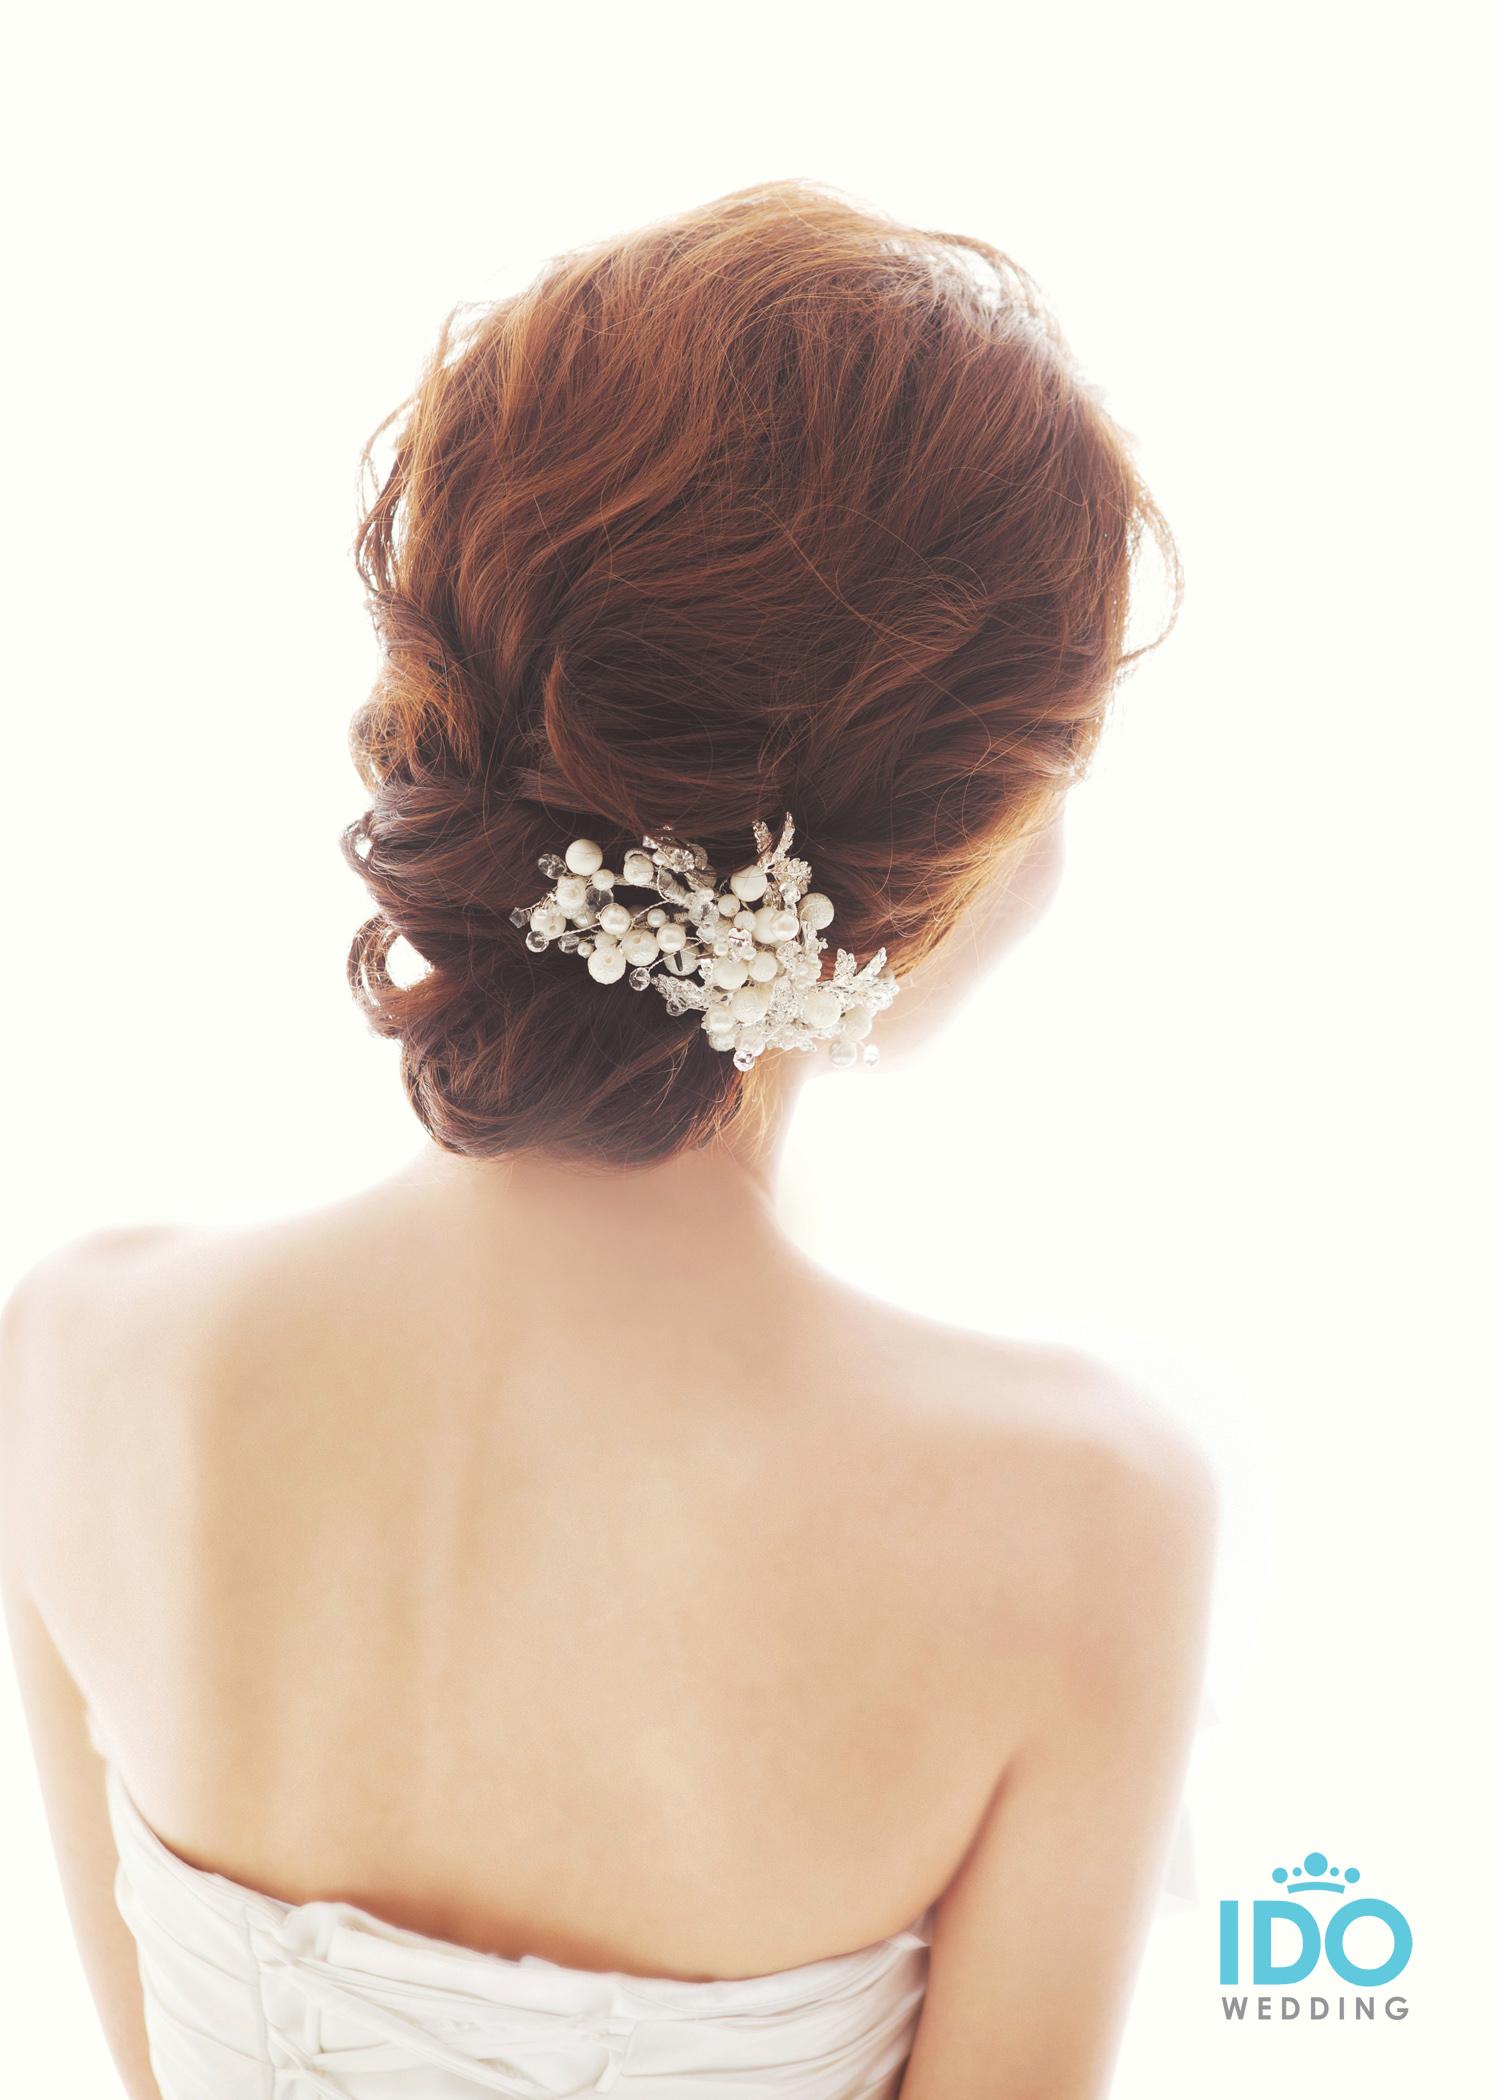 korean wedding hairstyle - low tie | korean wedding photography